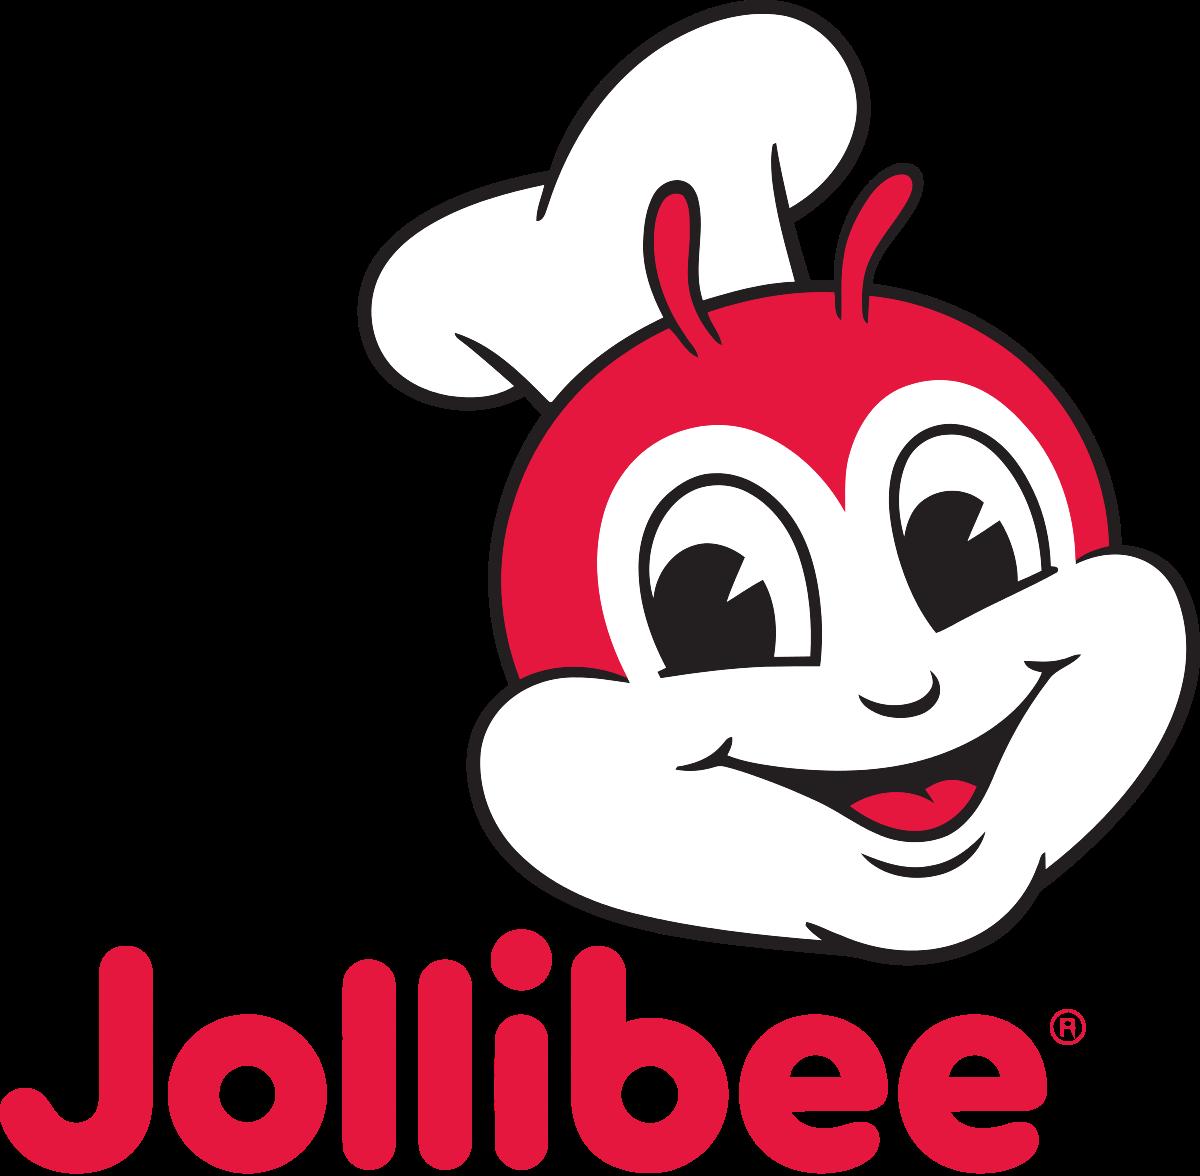 Jollibee.